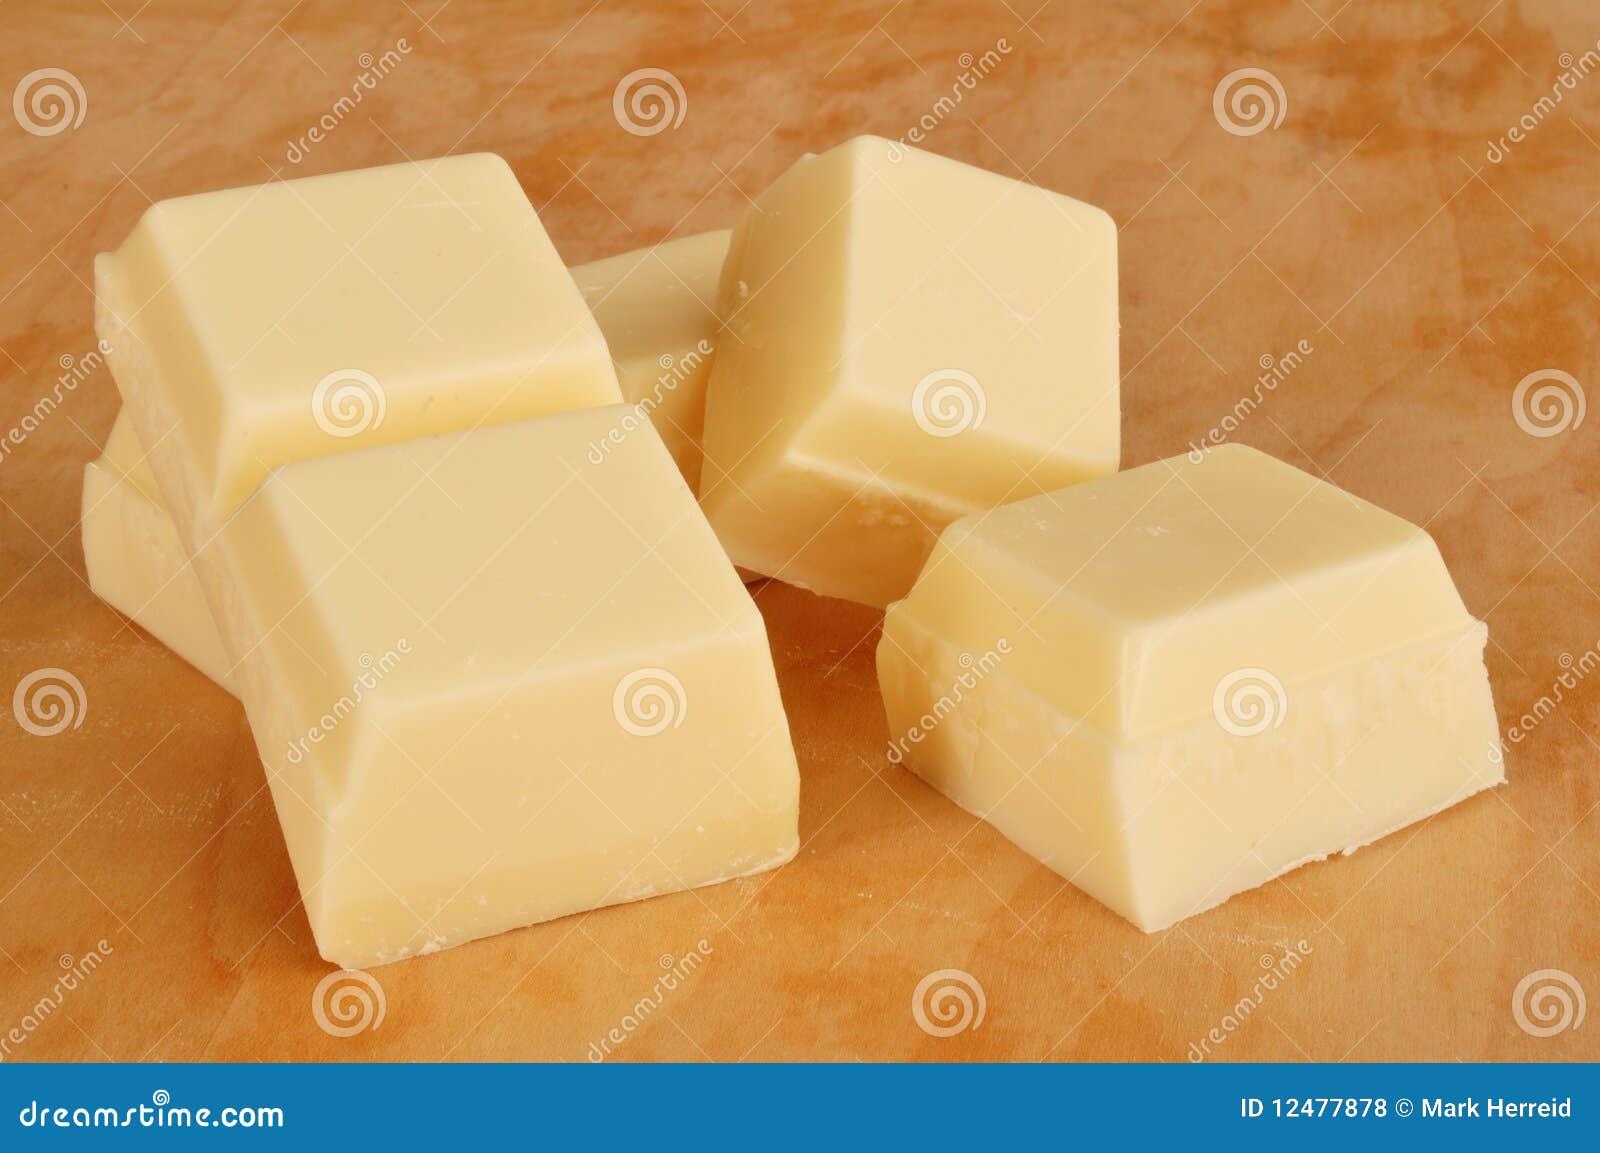 Vanilla Flavored Almond Bark (White Chocolate) Royalty Free Stock ...